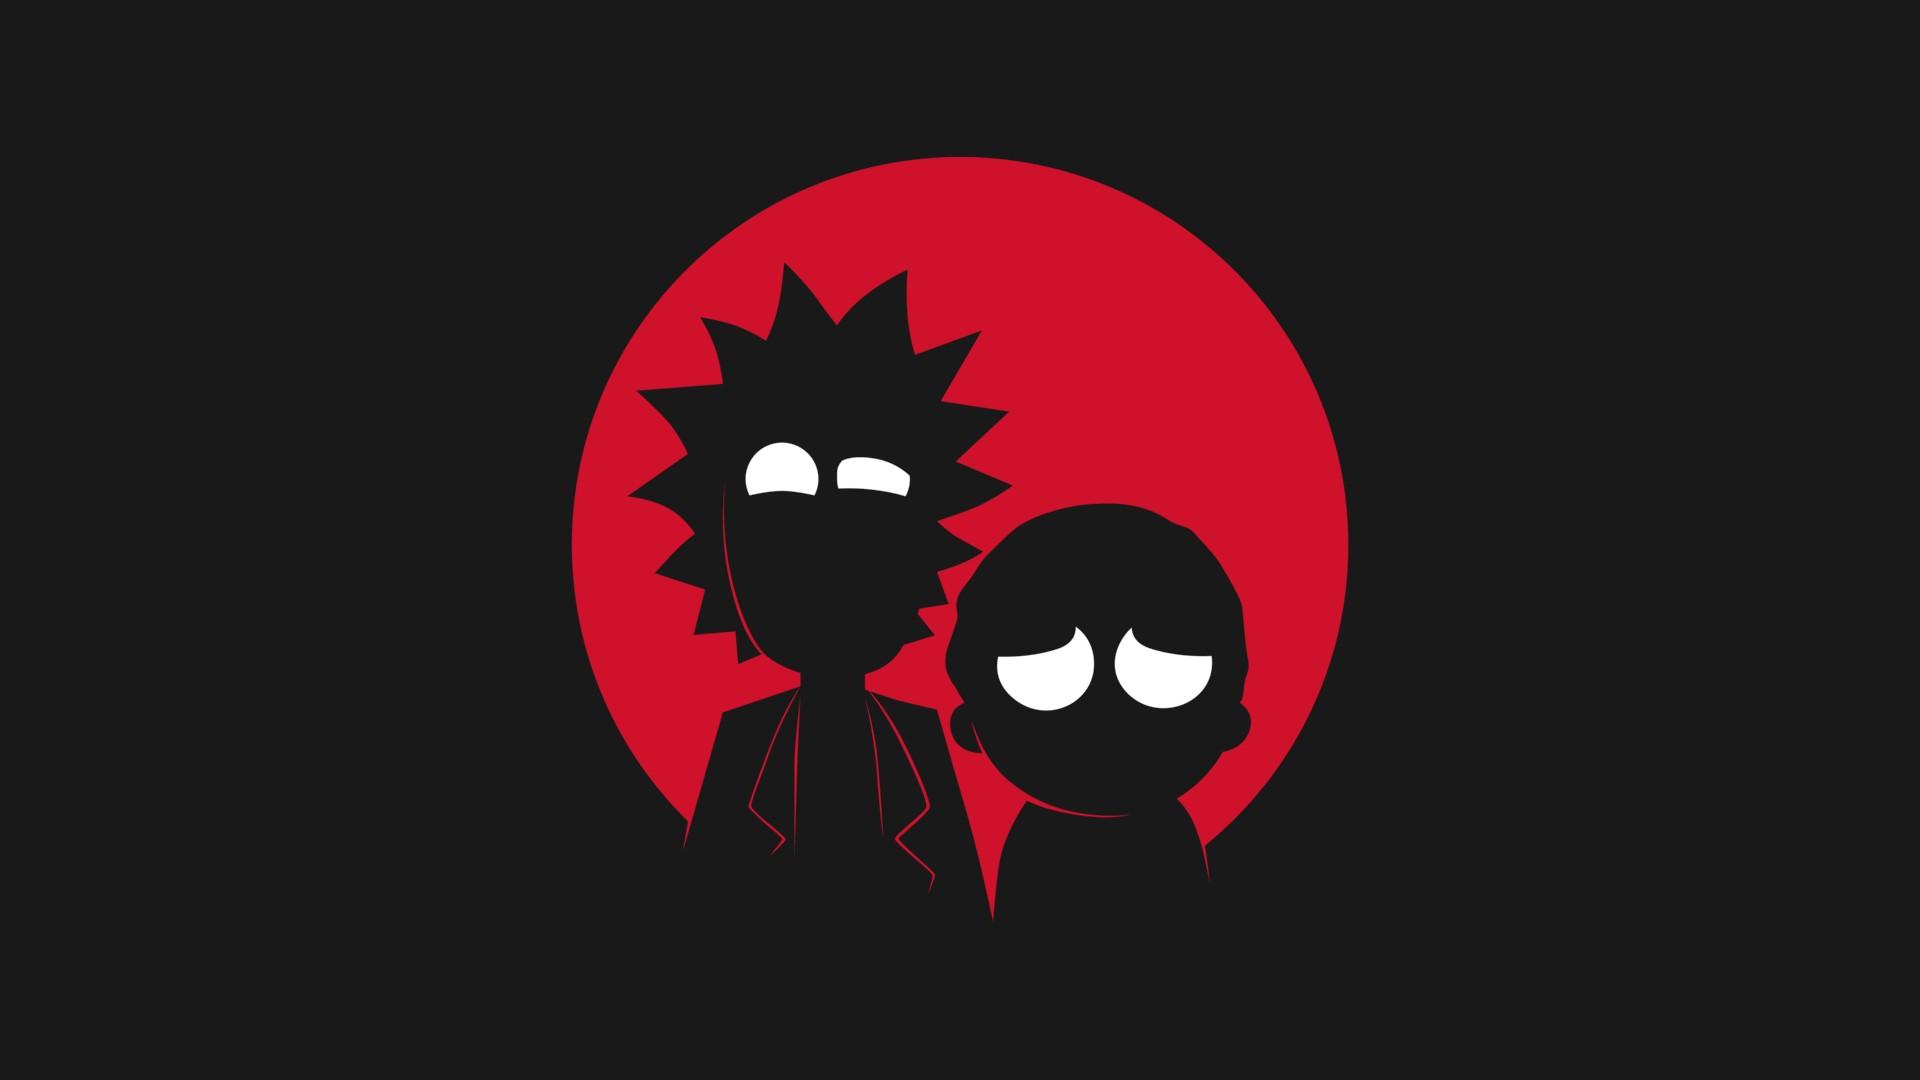 Rick, Wallpaper, And Morty Image - Rick And Morty - HD Wallpaper